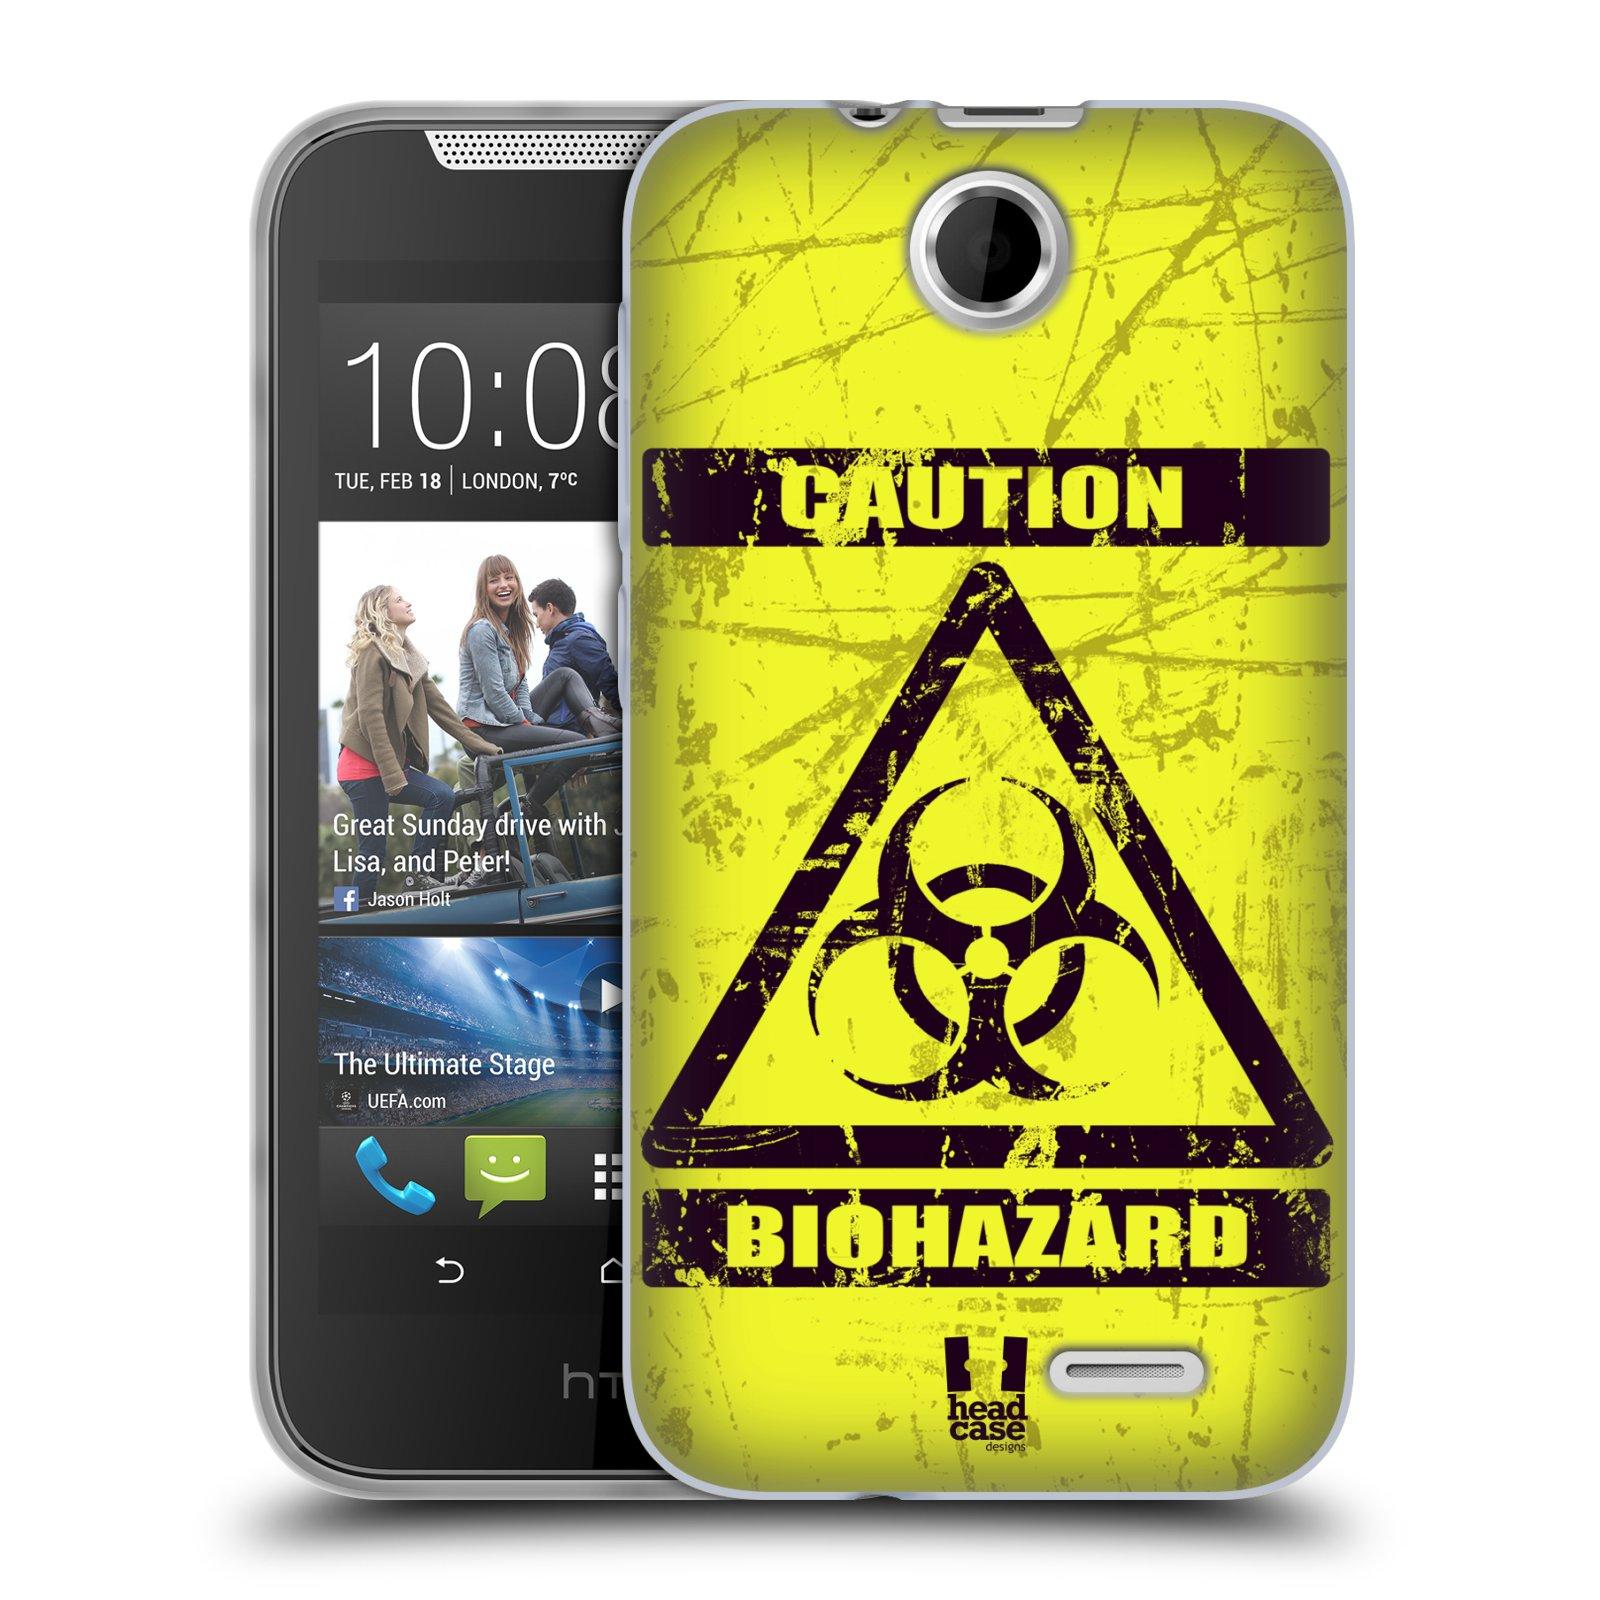 Silikonové pouzdro na mobil HTC Desire 310 HEAD CASE BIOHAZARD (Silikonový kryt či obal na mobilní telefon HTC Desire 310)